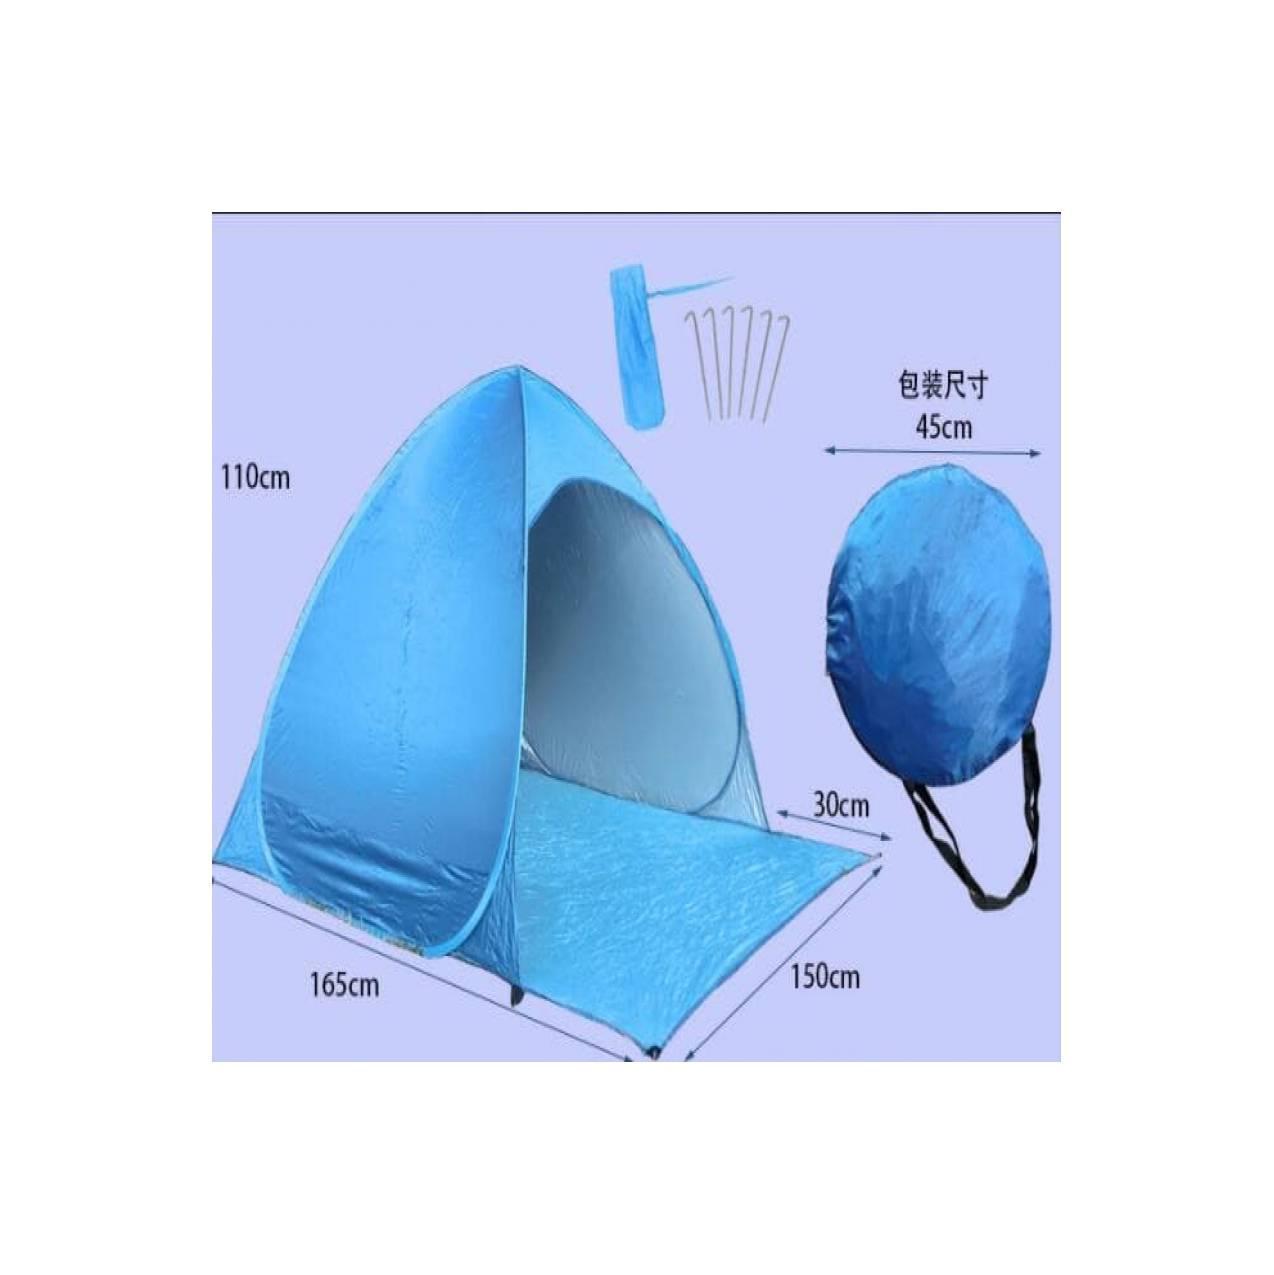 Tenda Camping Tenda Eiger Frame Tenda Tenda Lipat Tenda Dome